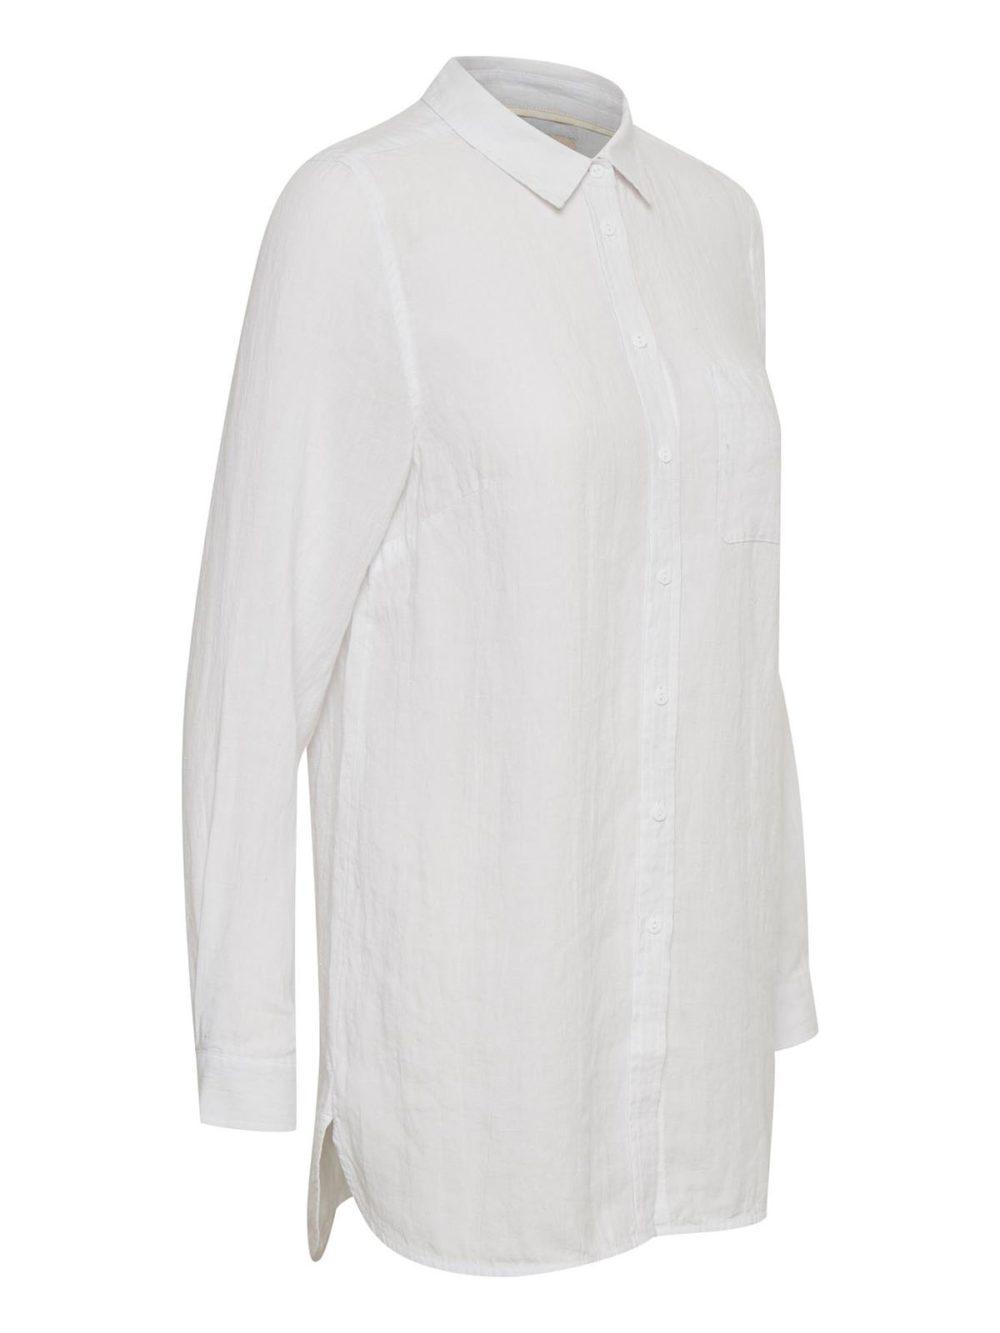 Kiva Shirt Part Two Katie Kerr Women's Clothing